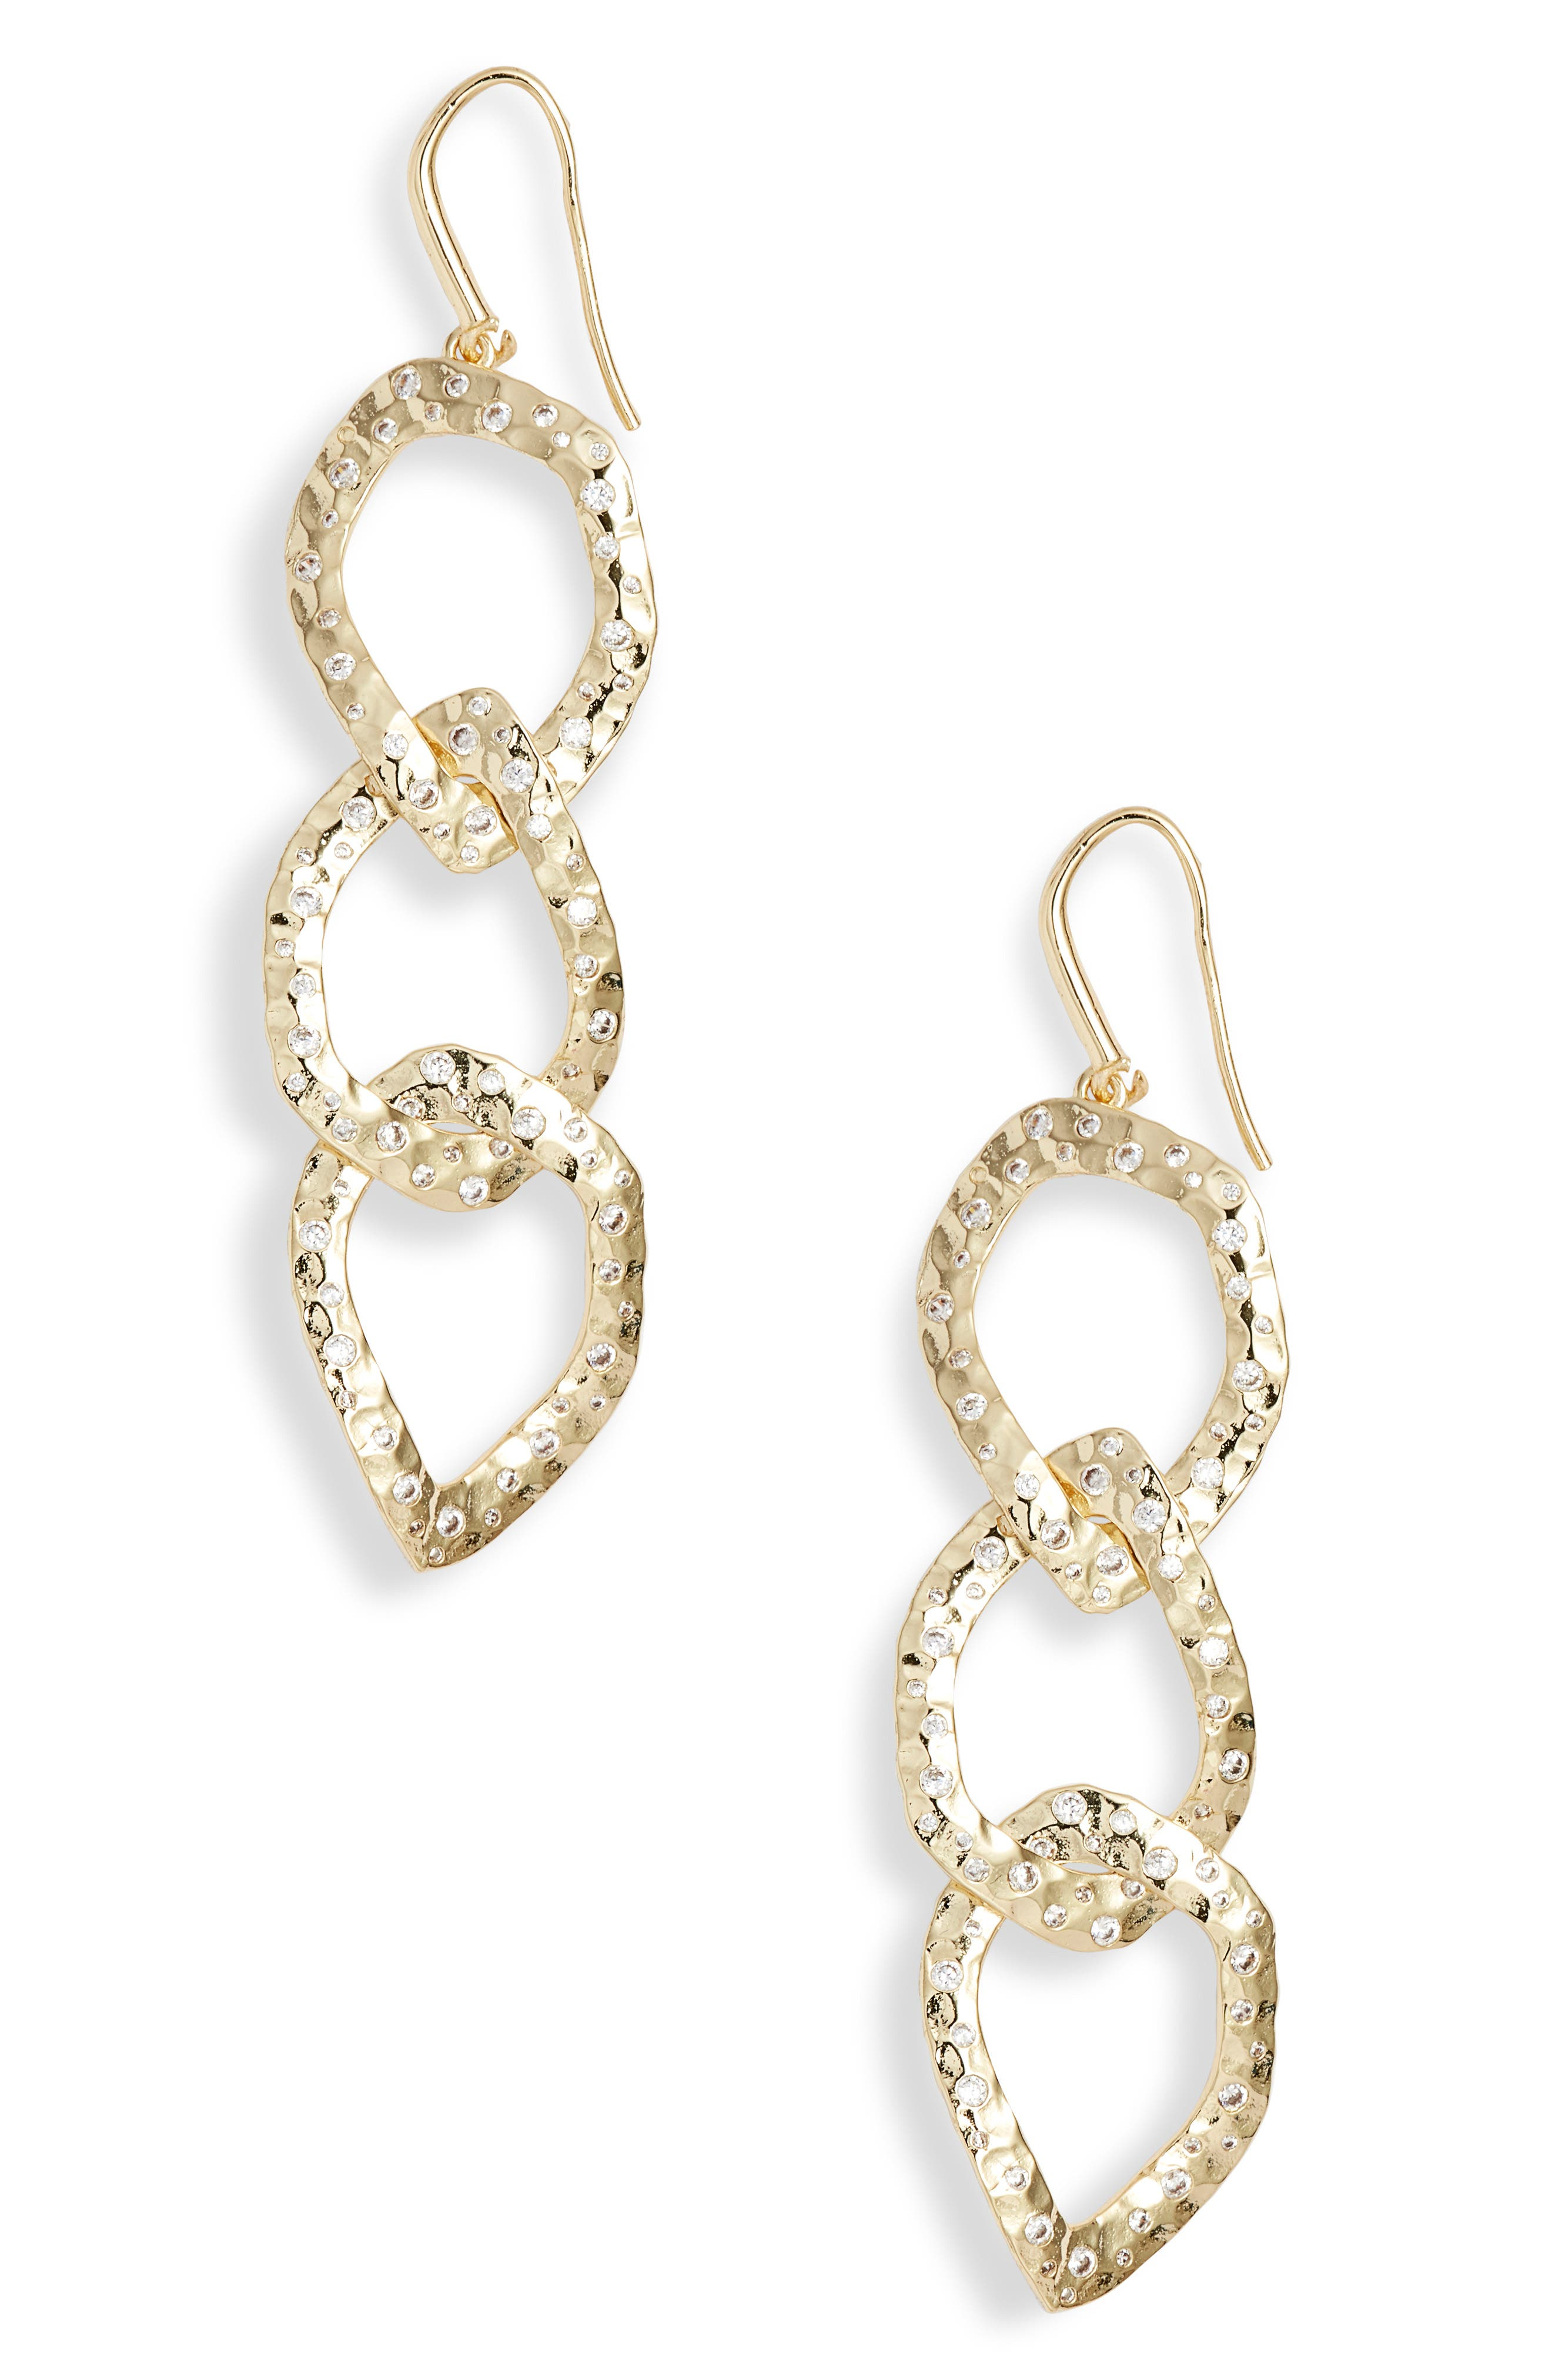 MELINDA MARIA Chain Link Linear Drop Earrings in Gold/ White Cz